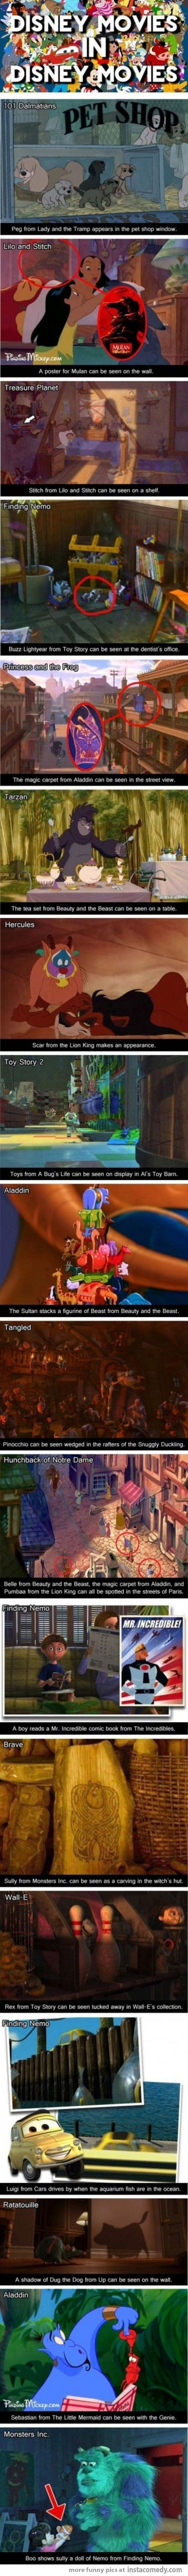 Disney Movie Conspiracy